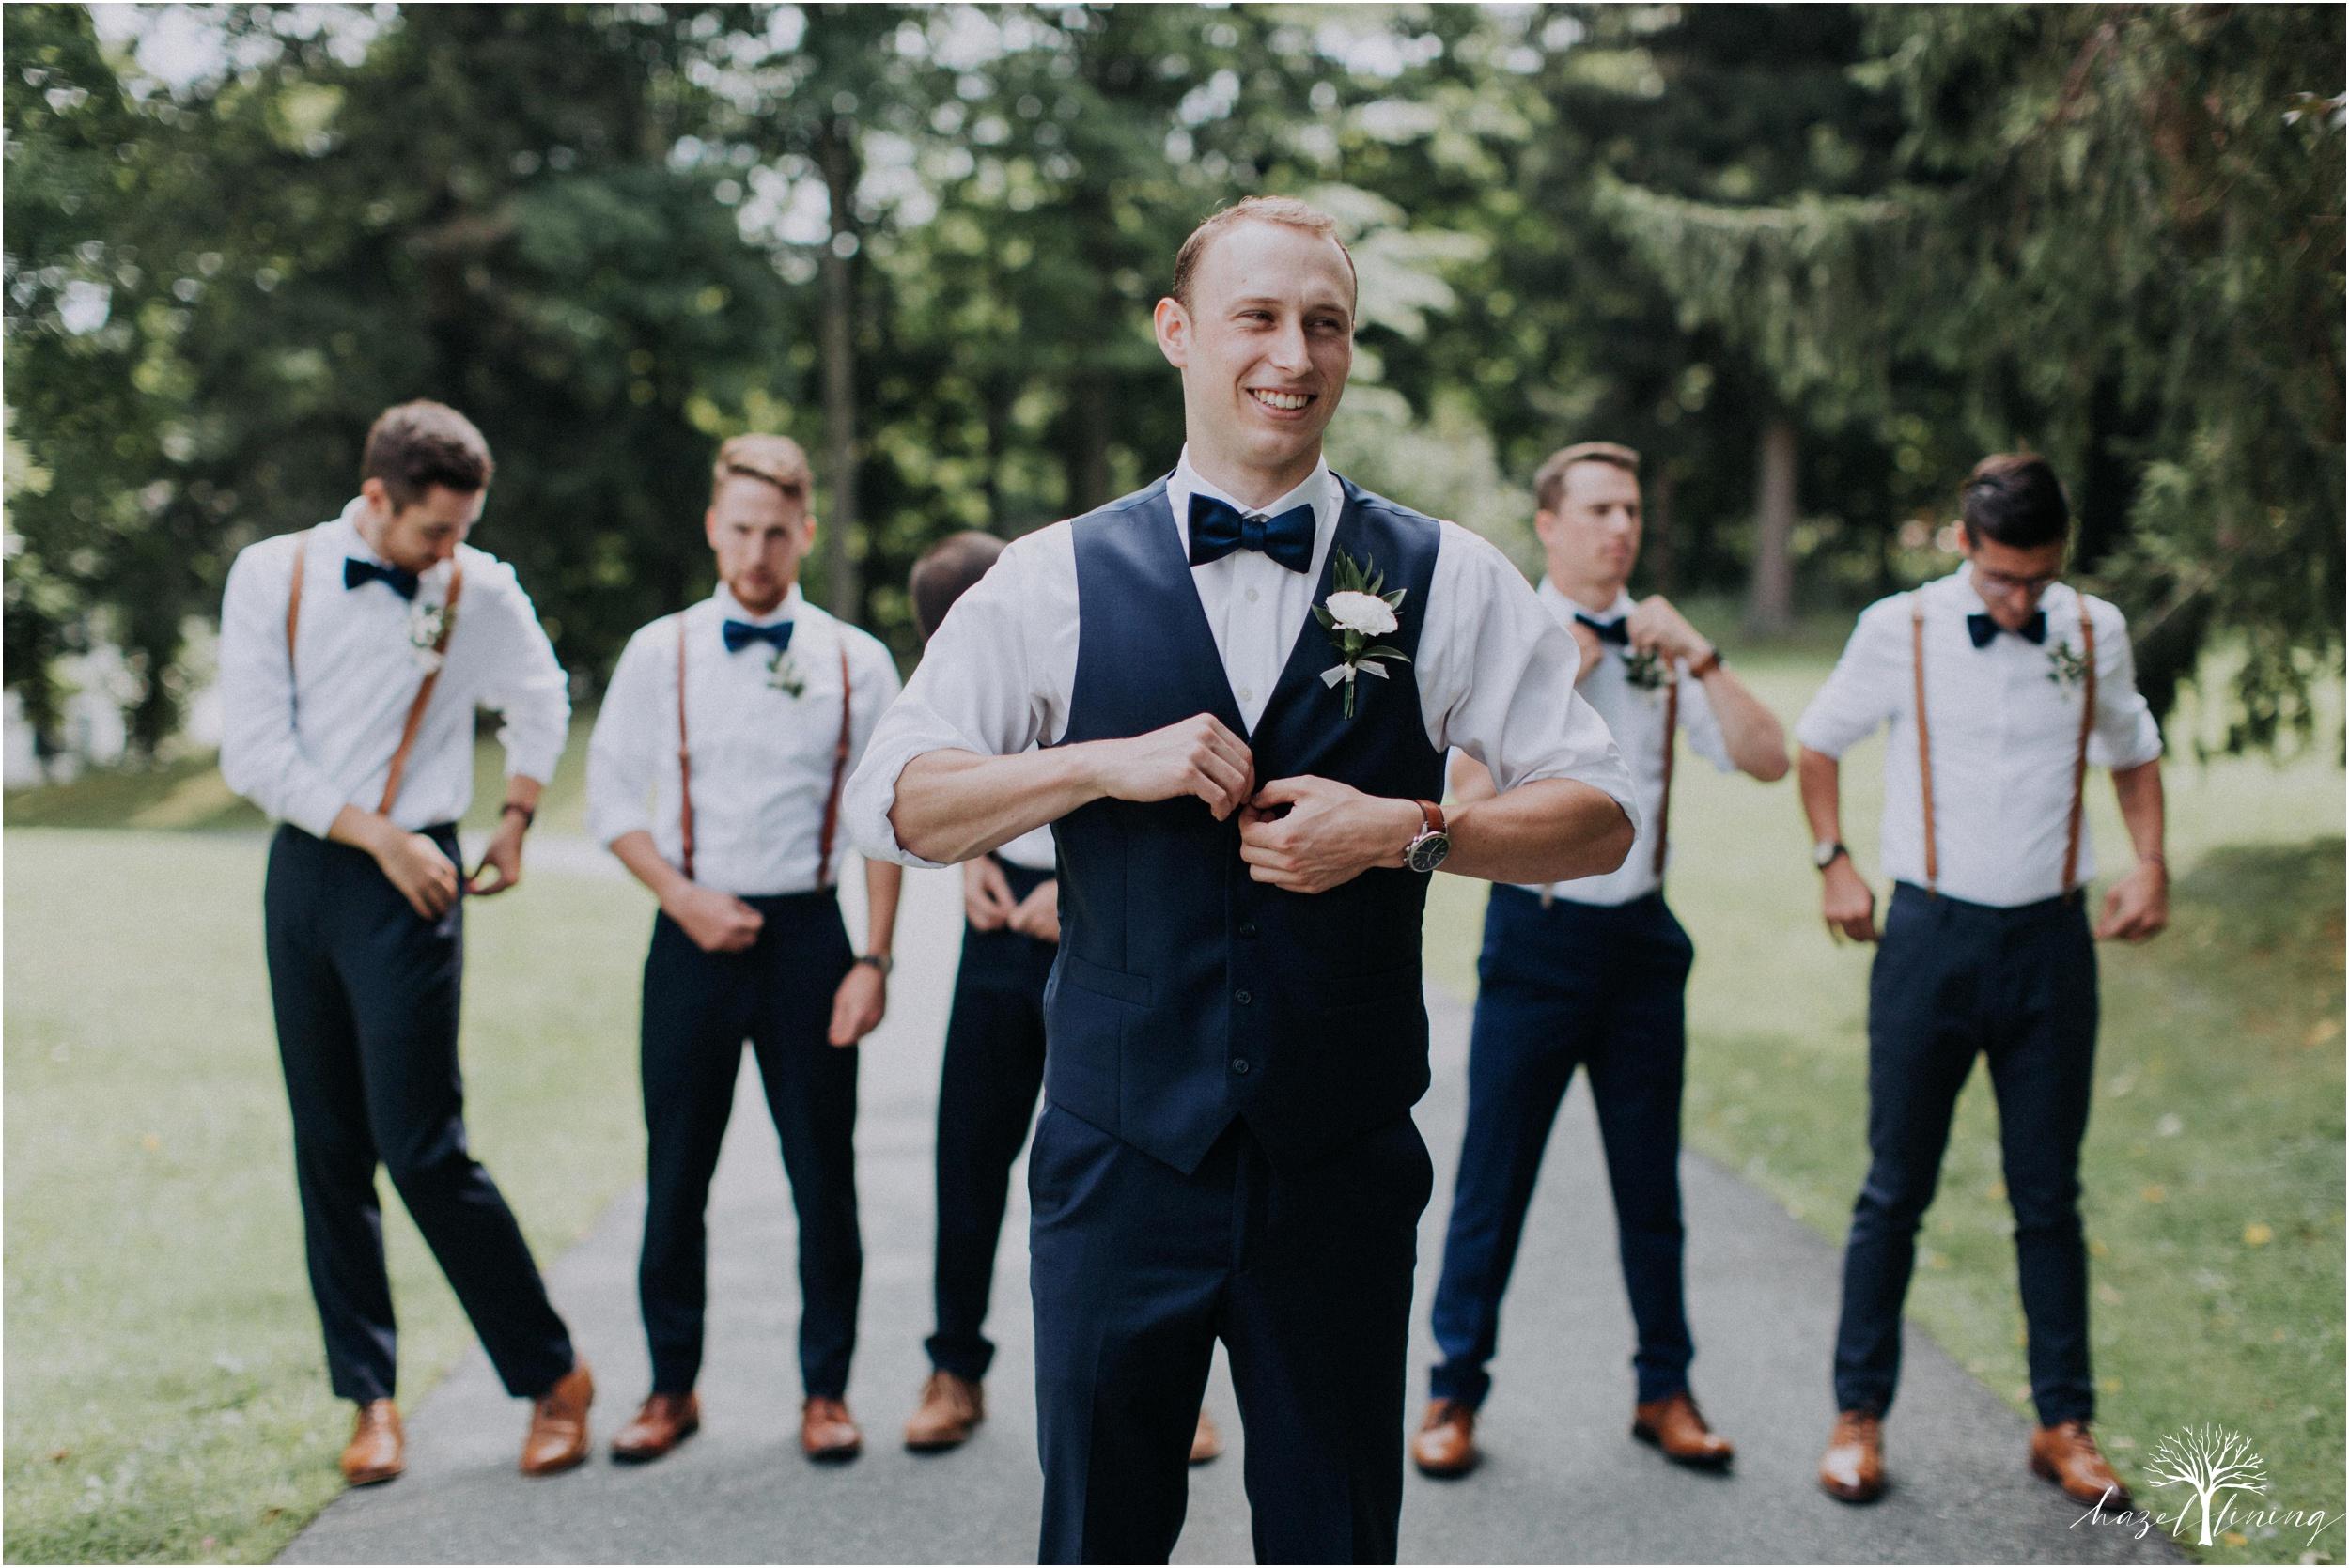 mariah-kreyling-samuel-sherratt-sherrattwiththeworld-peirce-farm-at-witch-hill-boston-massachusetts-wedding-photography-hazel-lining-travel-wedding-elopement-photography_0059.jpg